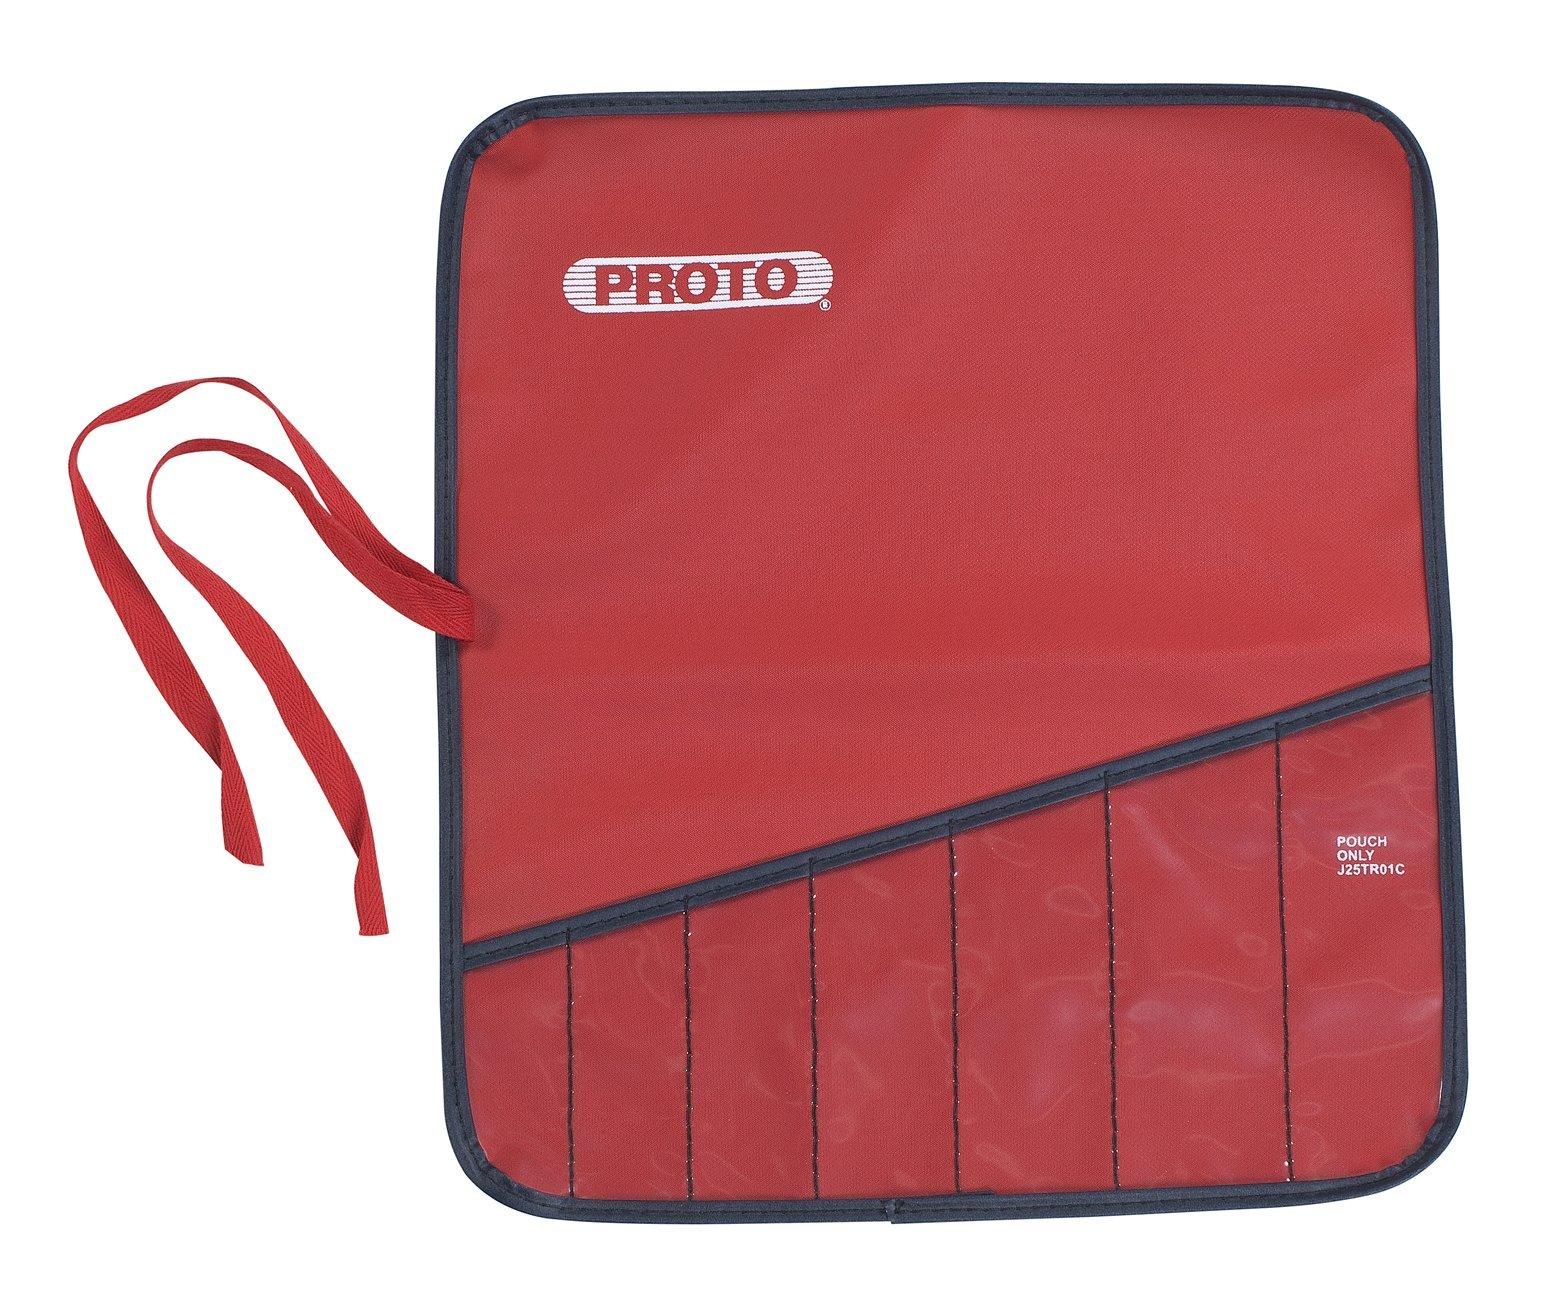 Stanley Proto J25TR31C Proto 7 Pocket Tool Roll by Proto